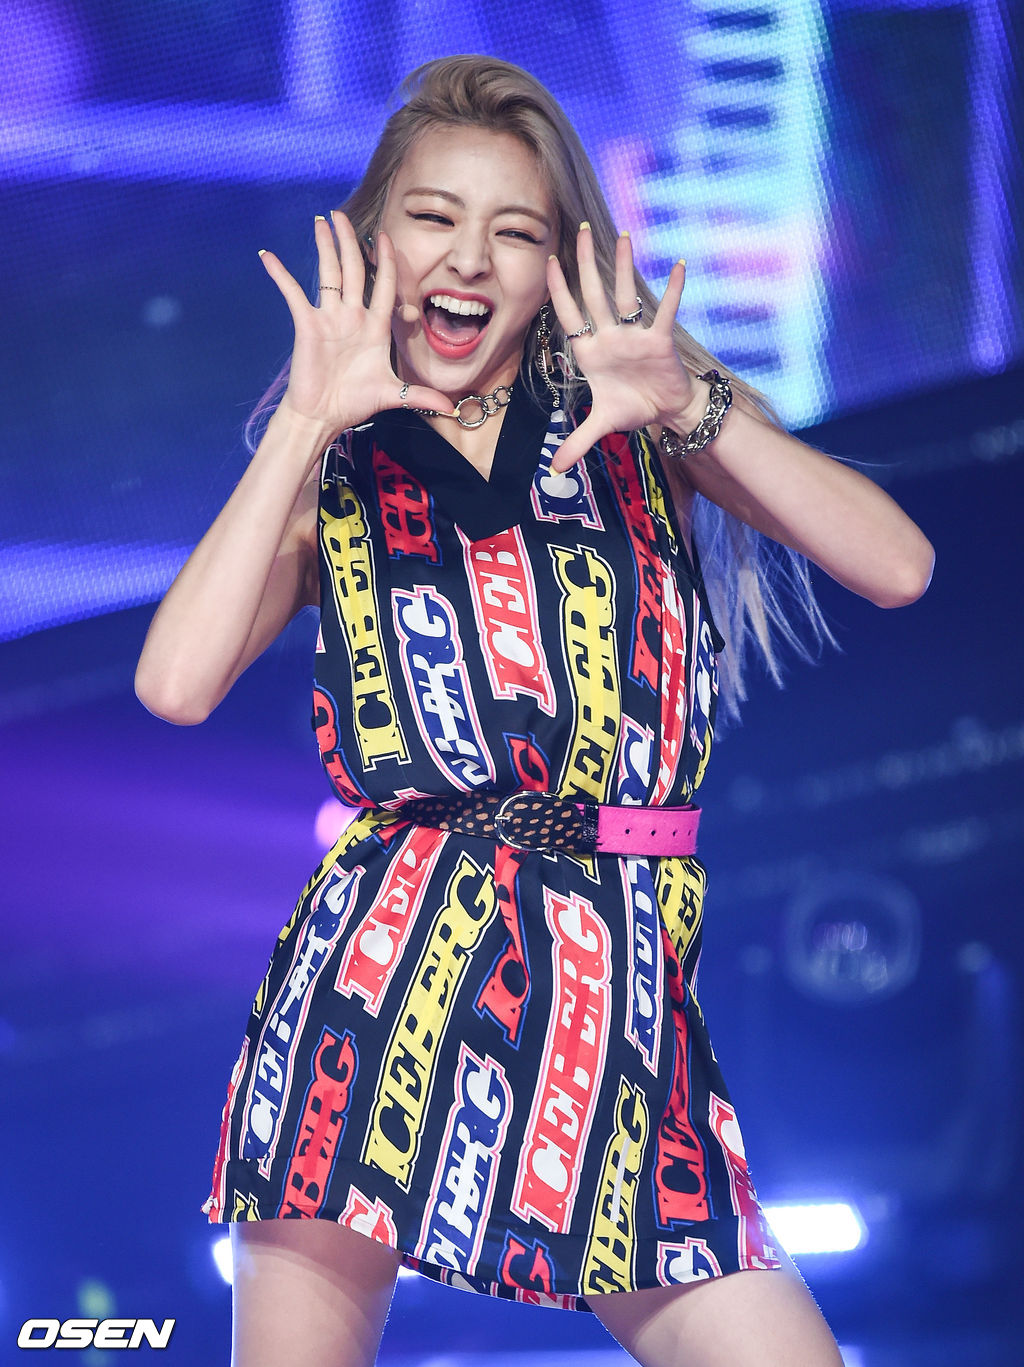 yuna show champion visual 3